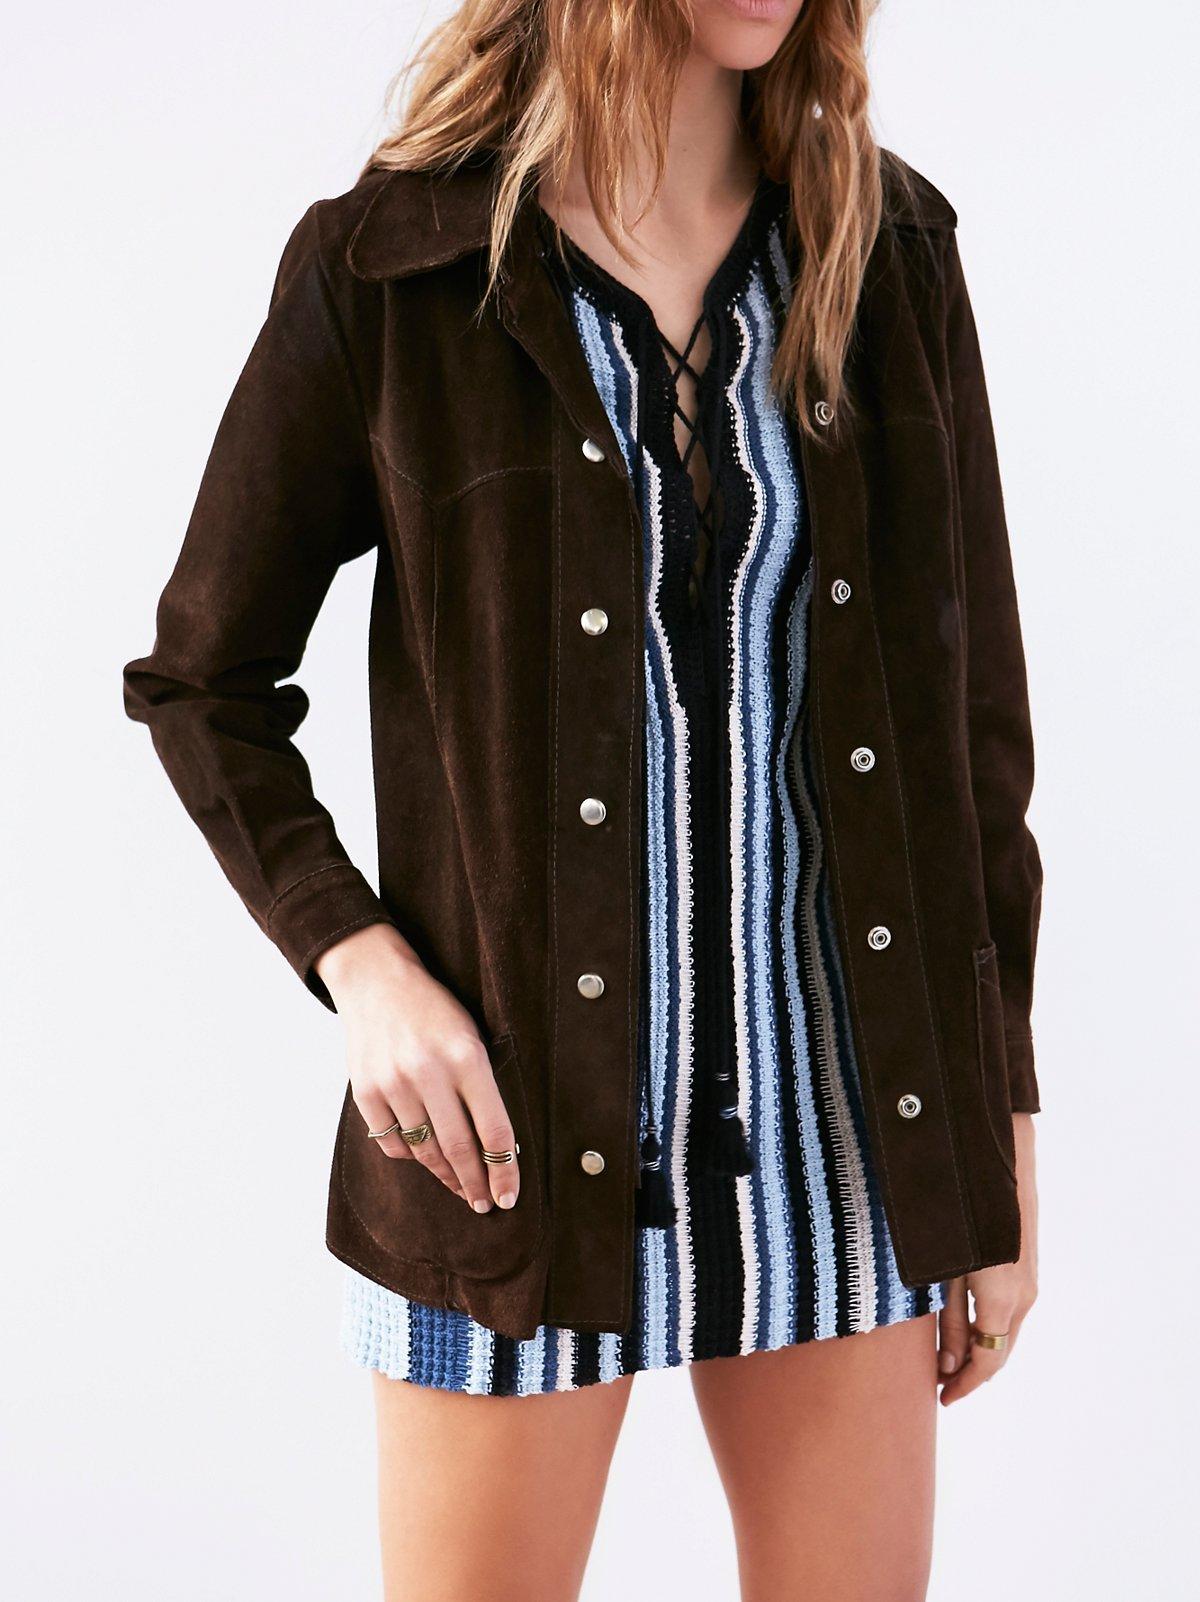 Vintage 60s Suede Jacket